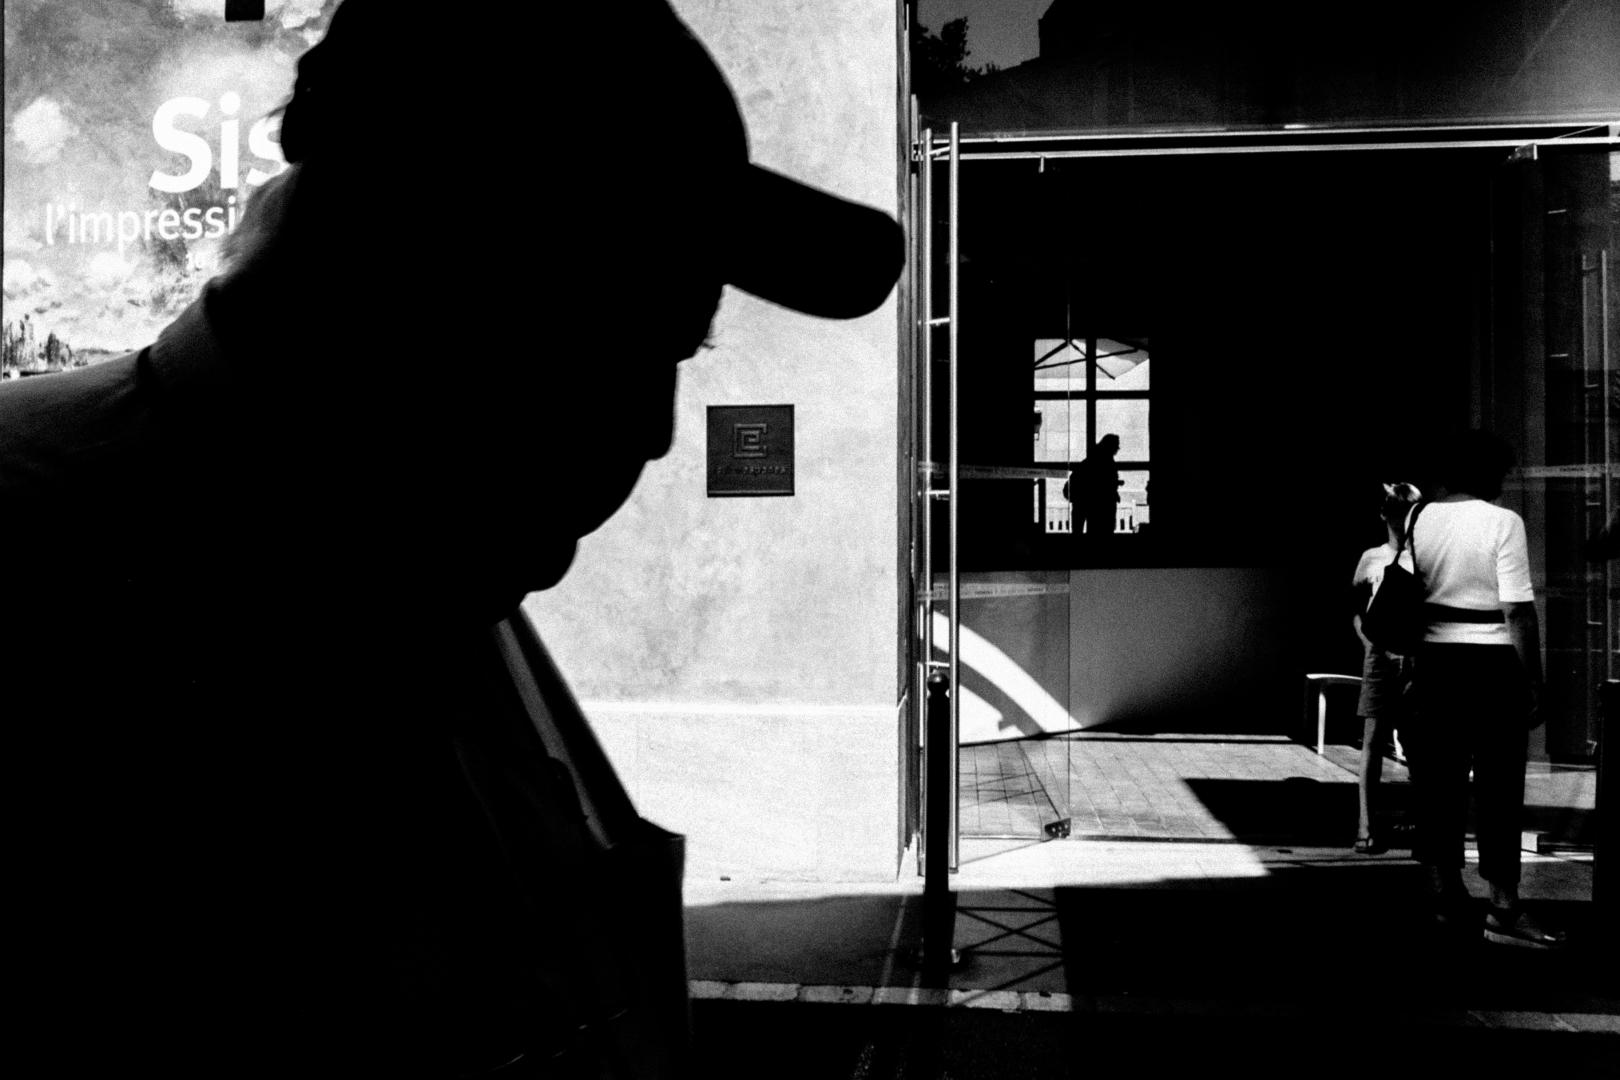 jeff-chane-mouye-street-photography-Aix-en-Provence-211